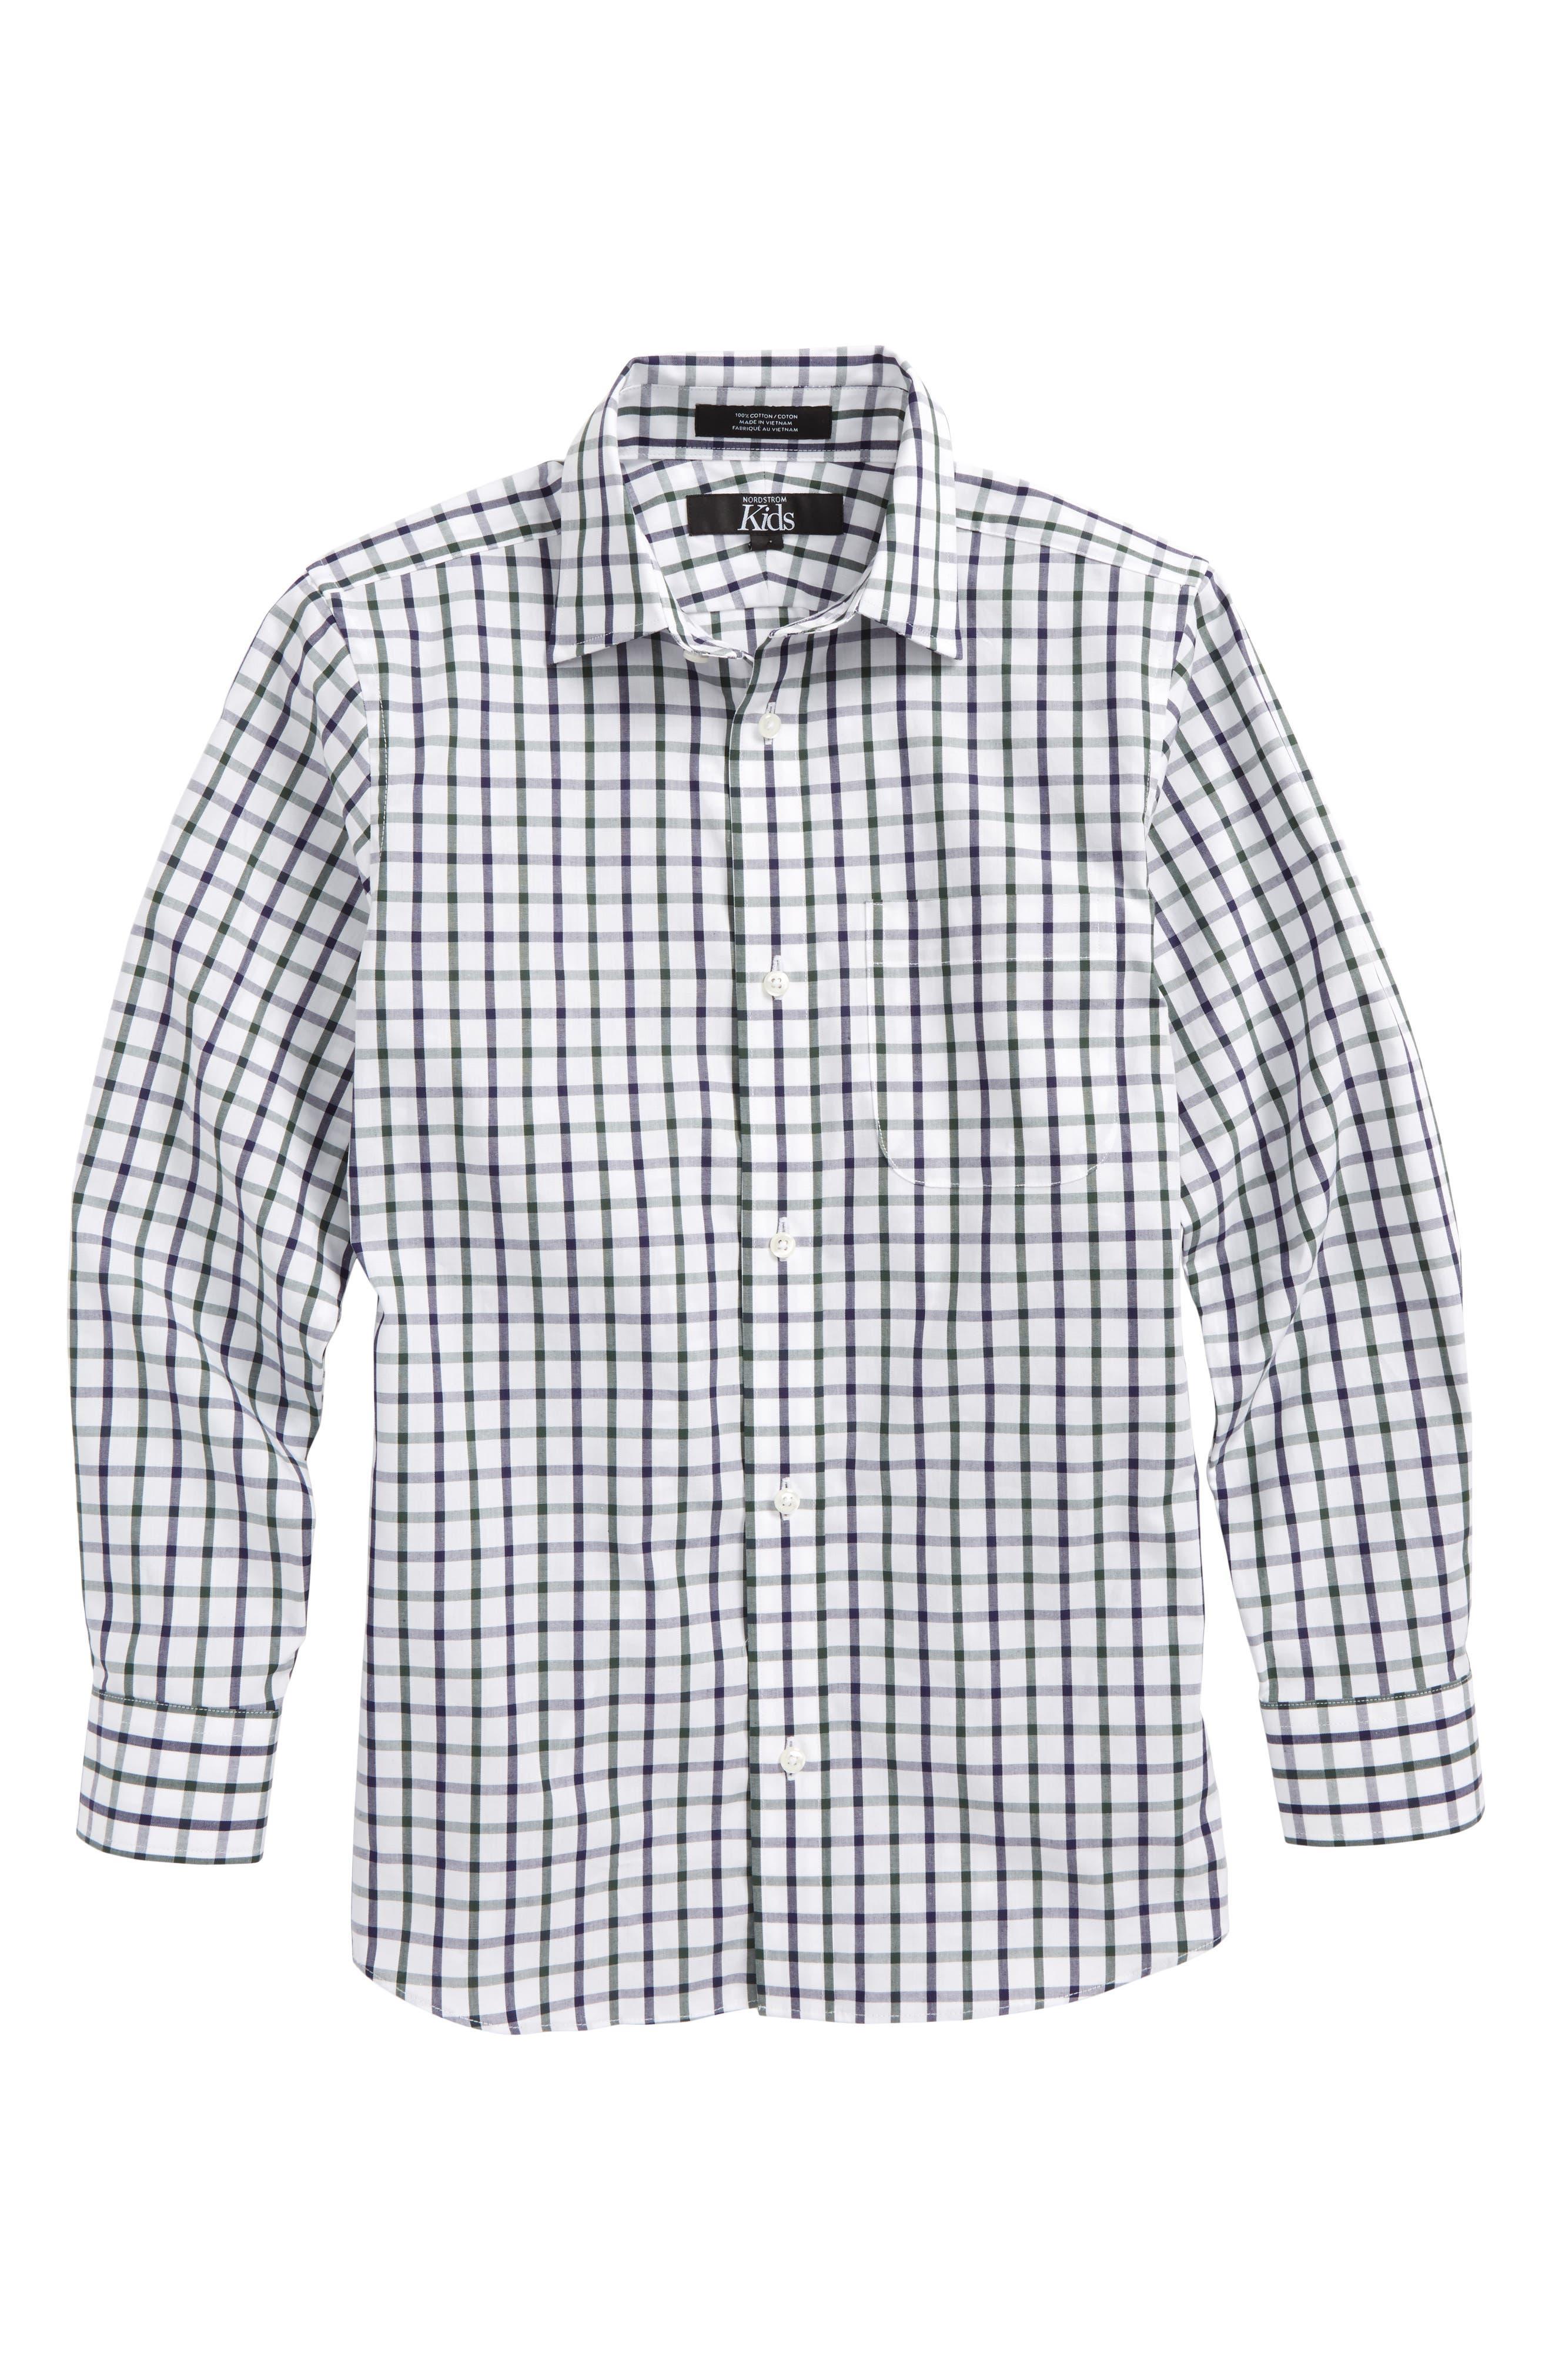 Windowpane Plaid Dress Shirt,                         Main,                         color, White-Navy Plaid